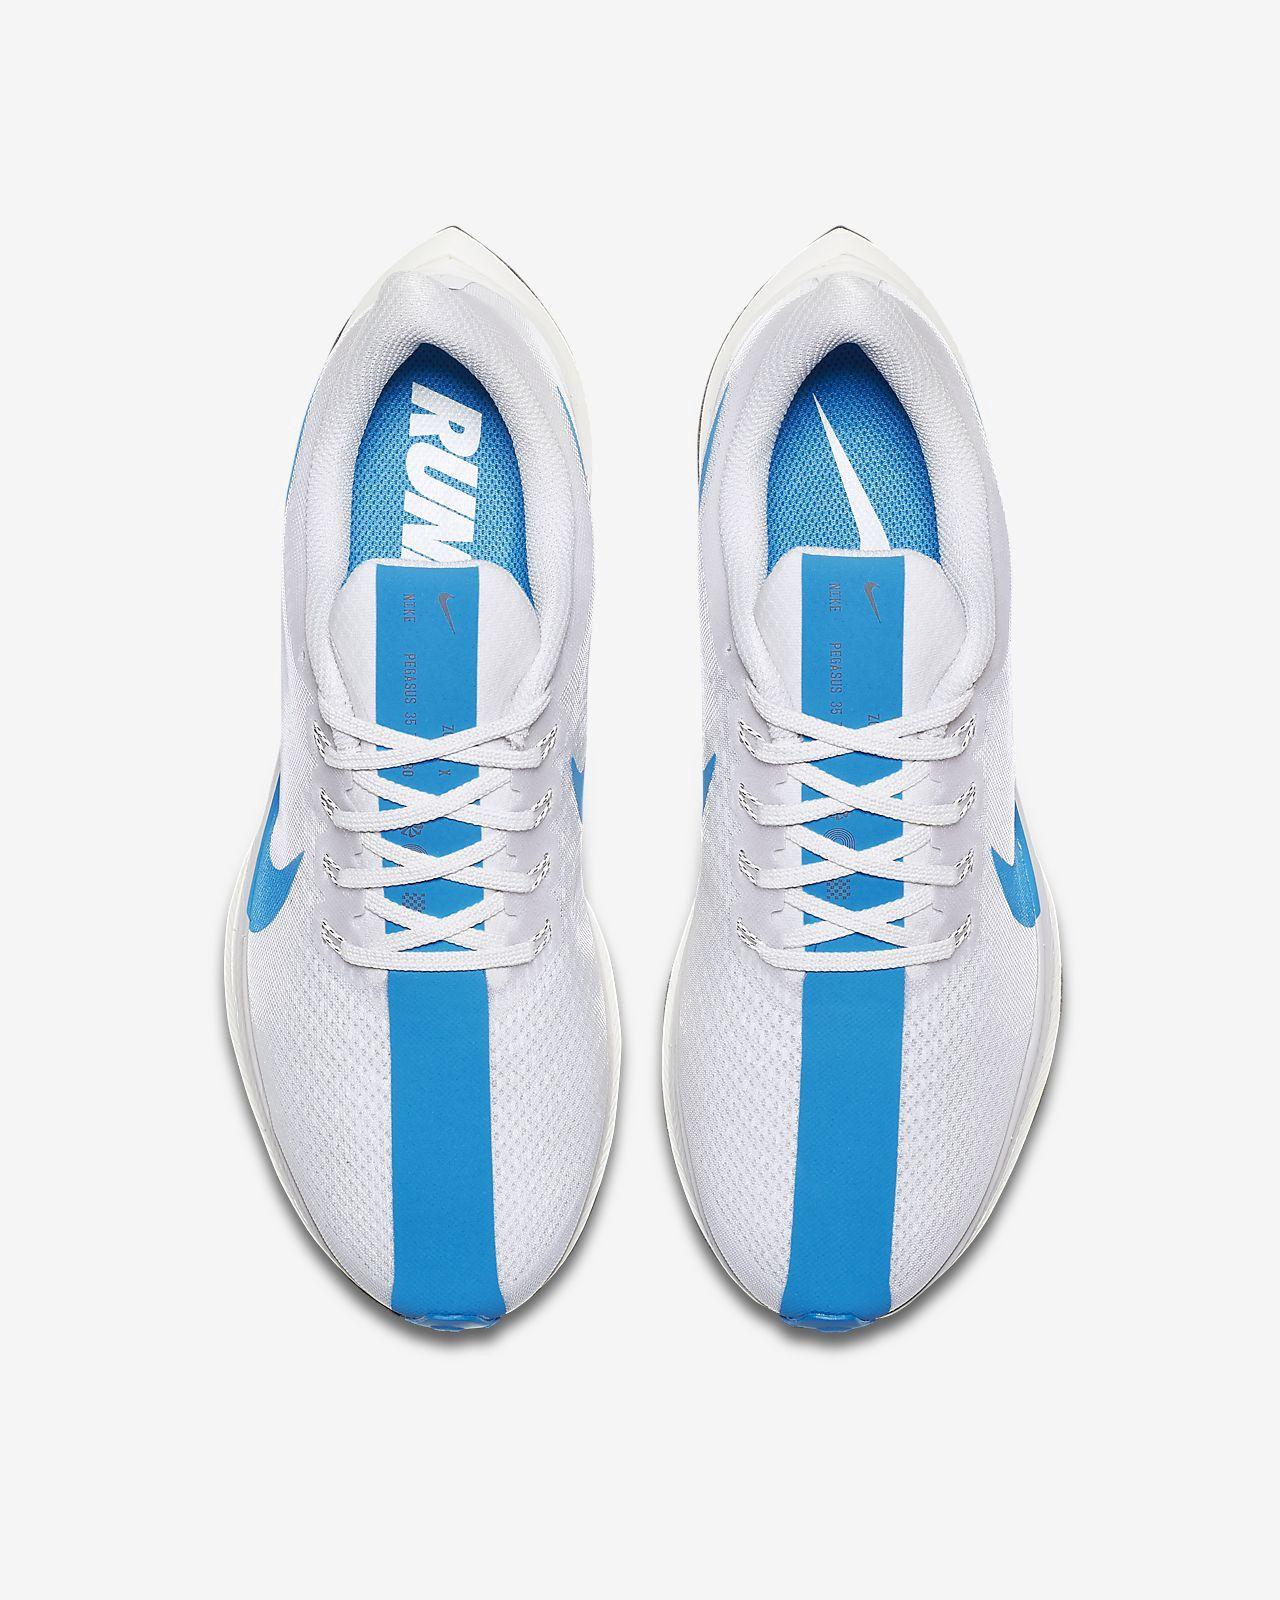 898ef26797fe Nike Zoom Pegasus Turbo Men s Running Shoe by Nike in 2019 ...